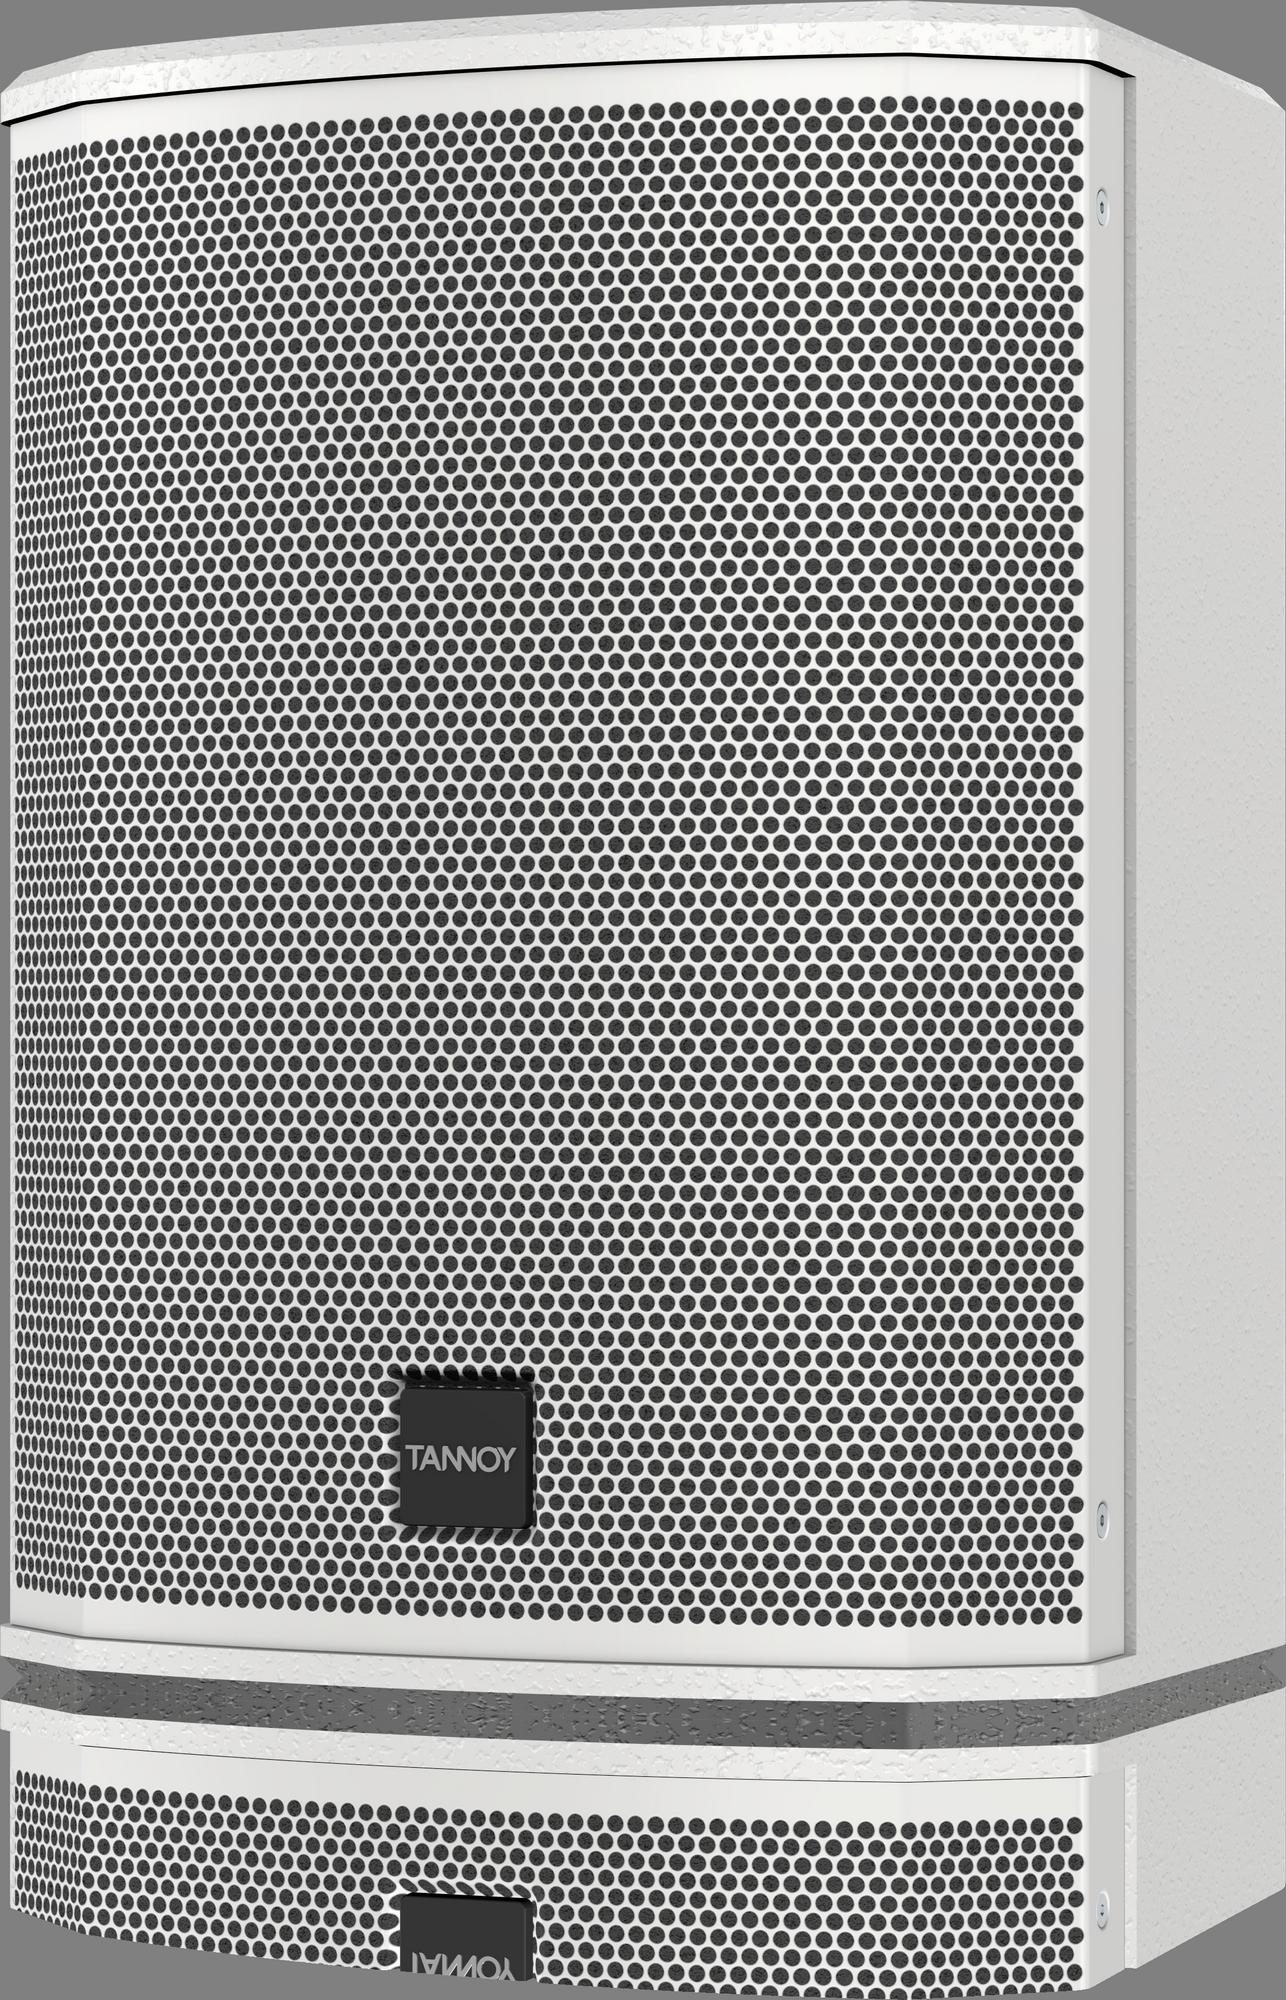 Tannoy  B-STOCK VX 8-WH - Dual Concentric full range speaker